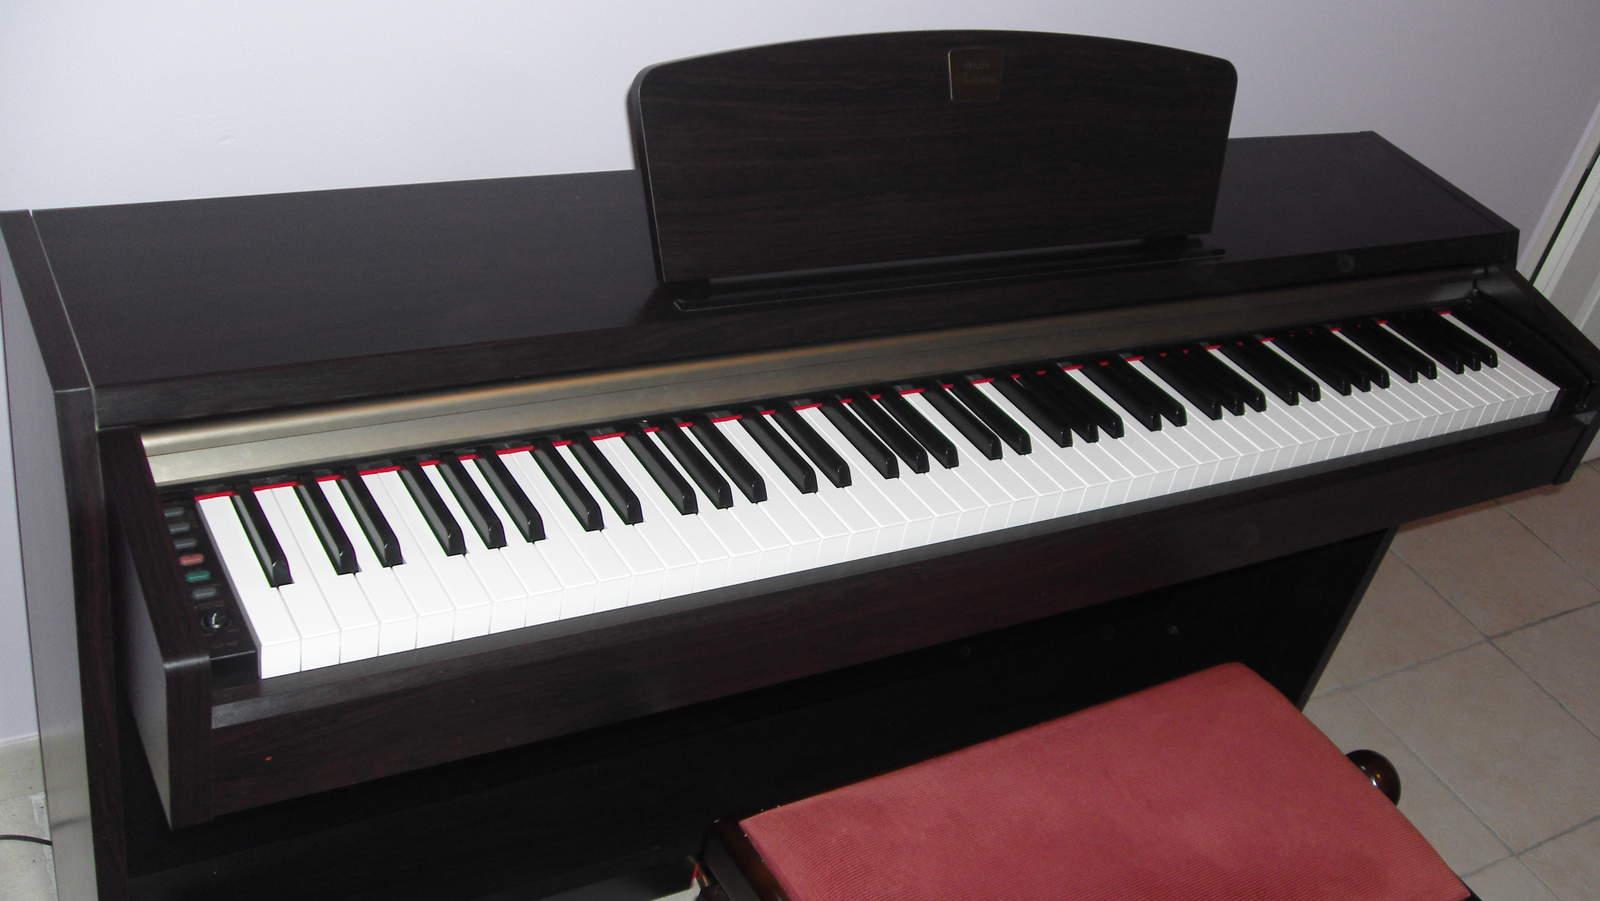 Yamaha clp 220 image 155615 audiofanzine for Yamaha clavinova price